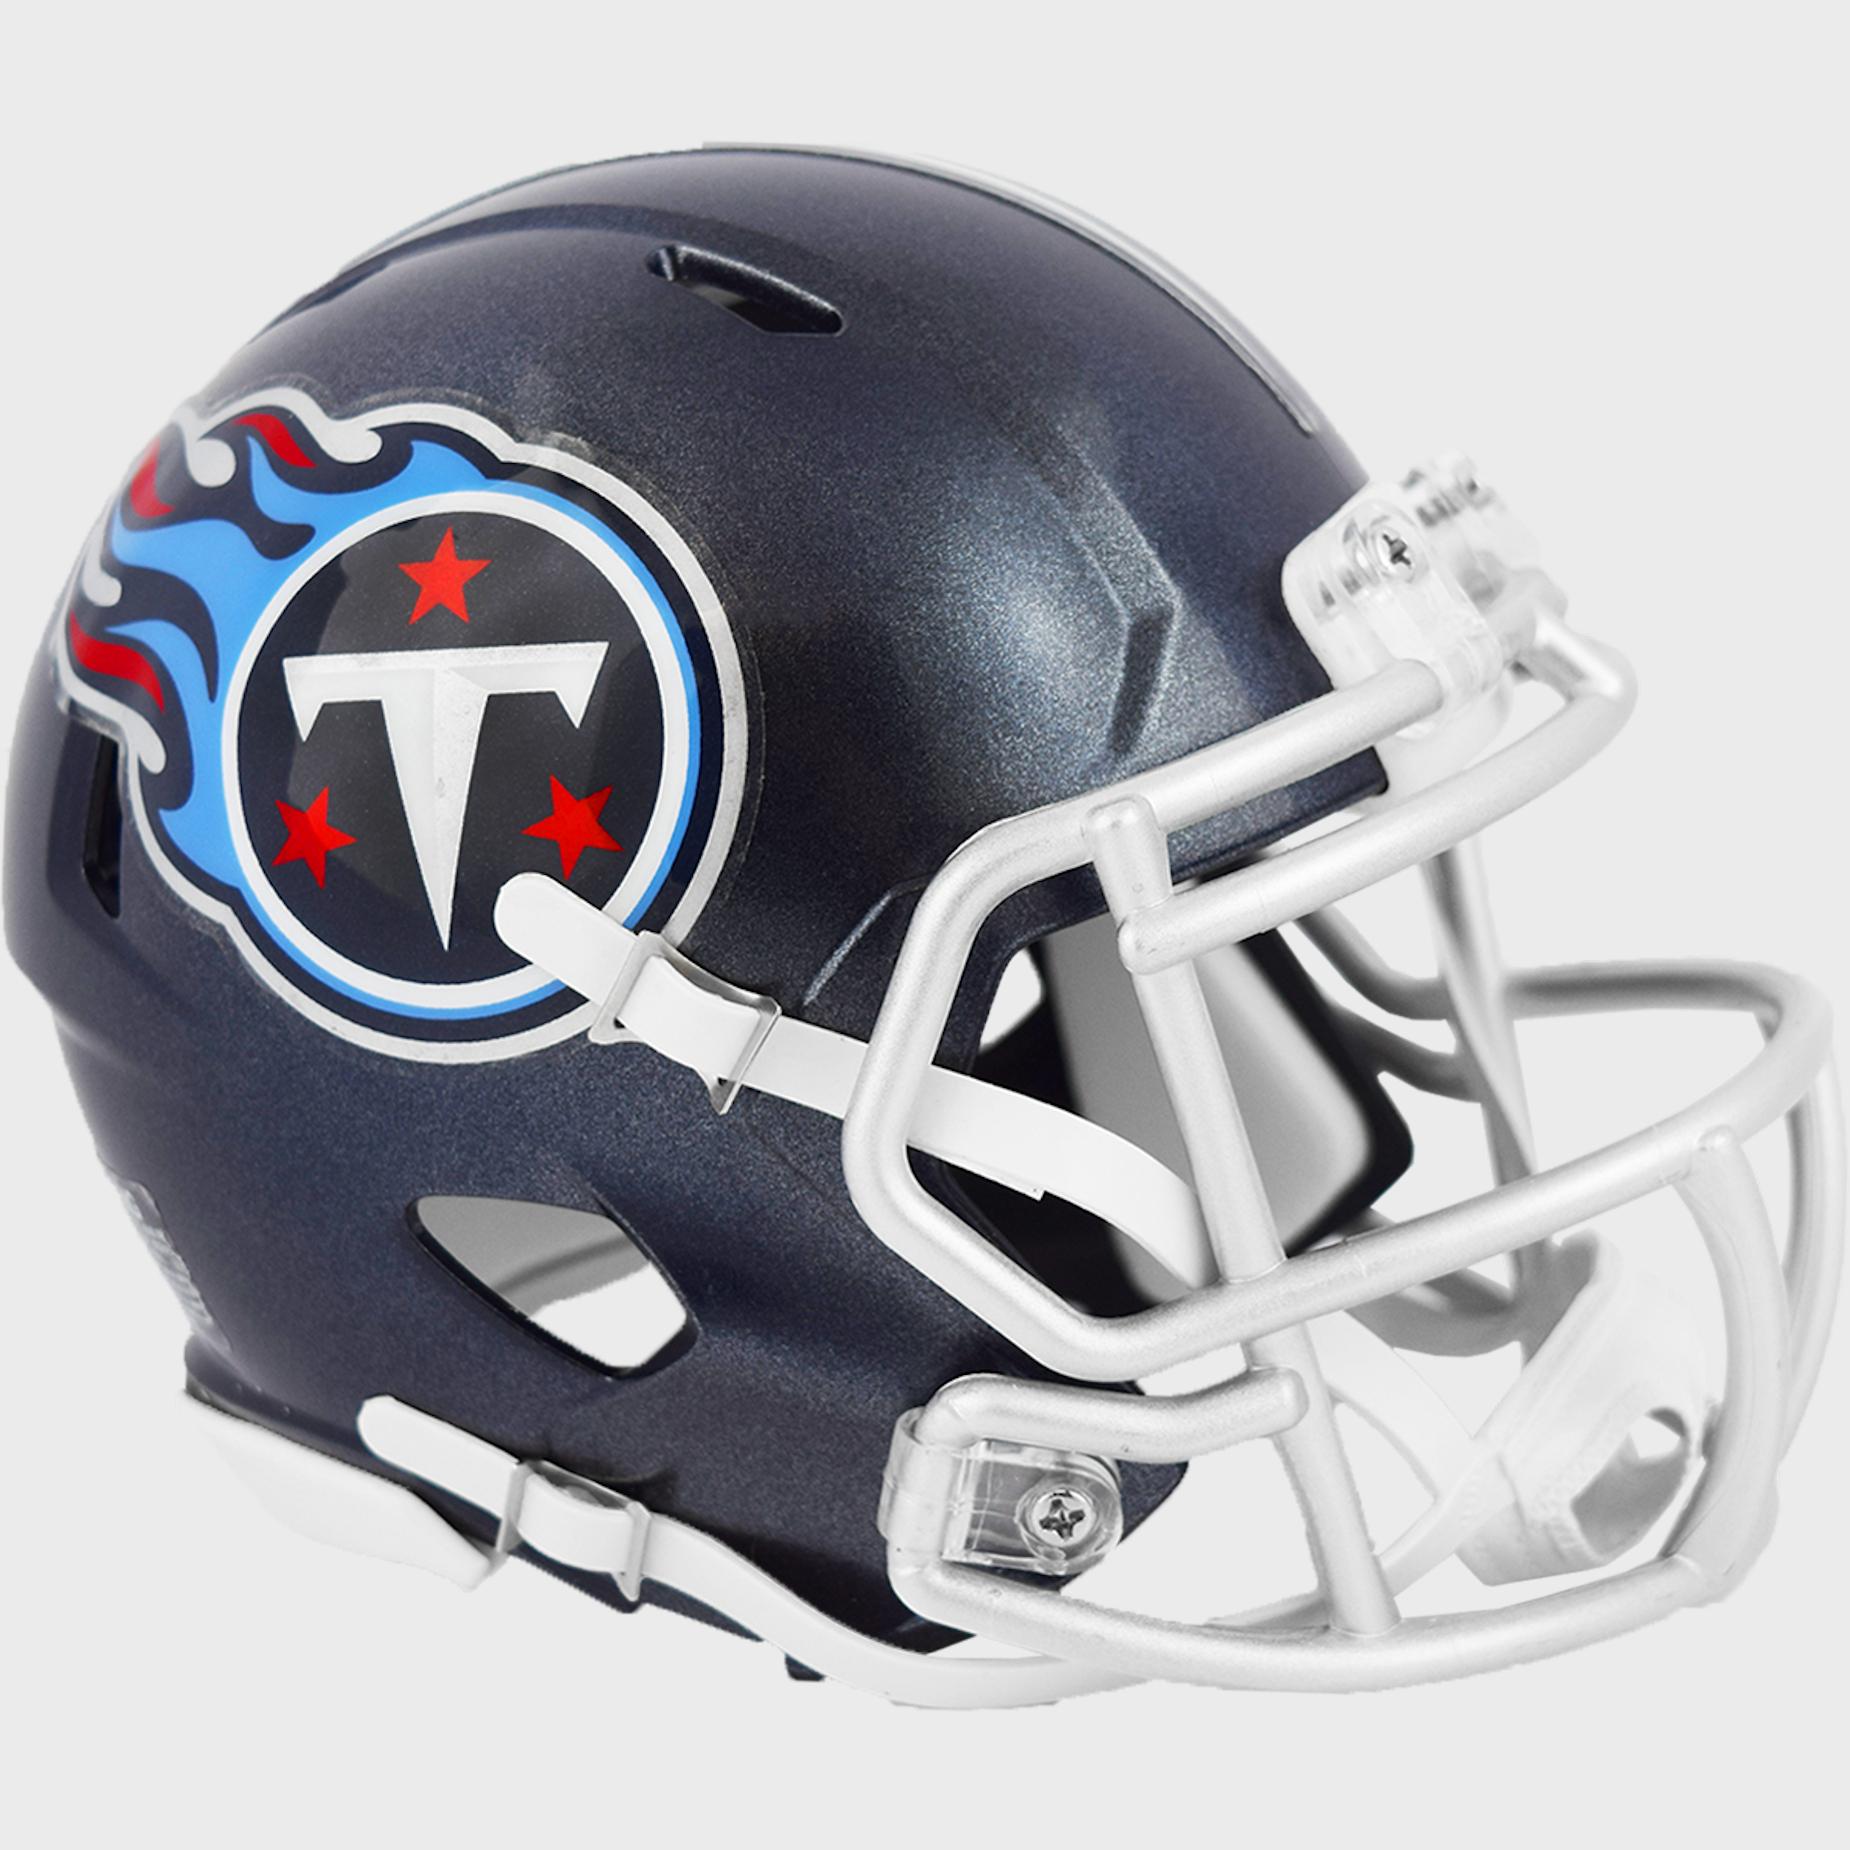 Tennessee Titans NFL Mini Speed Football Helmet <B>Satin Navy Metallic</B>